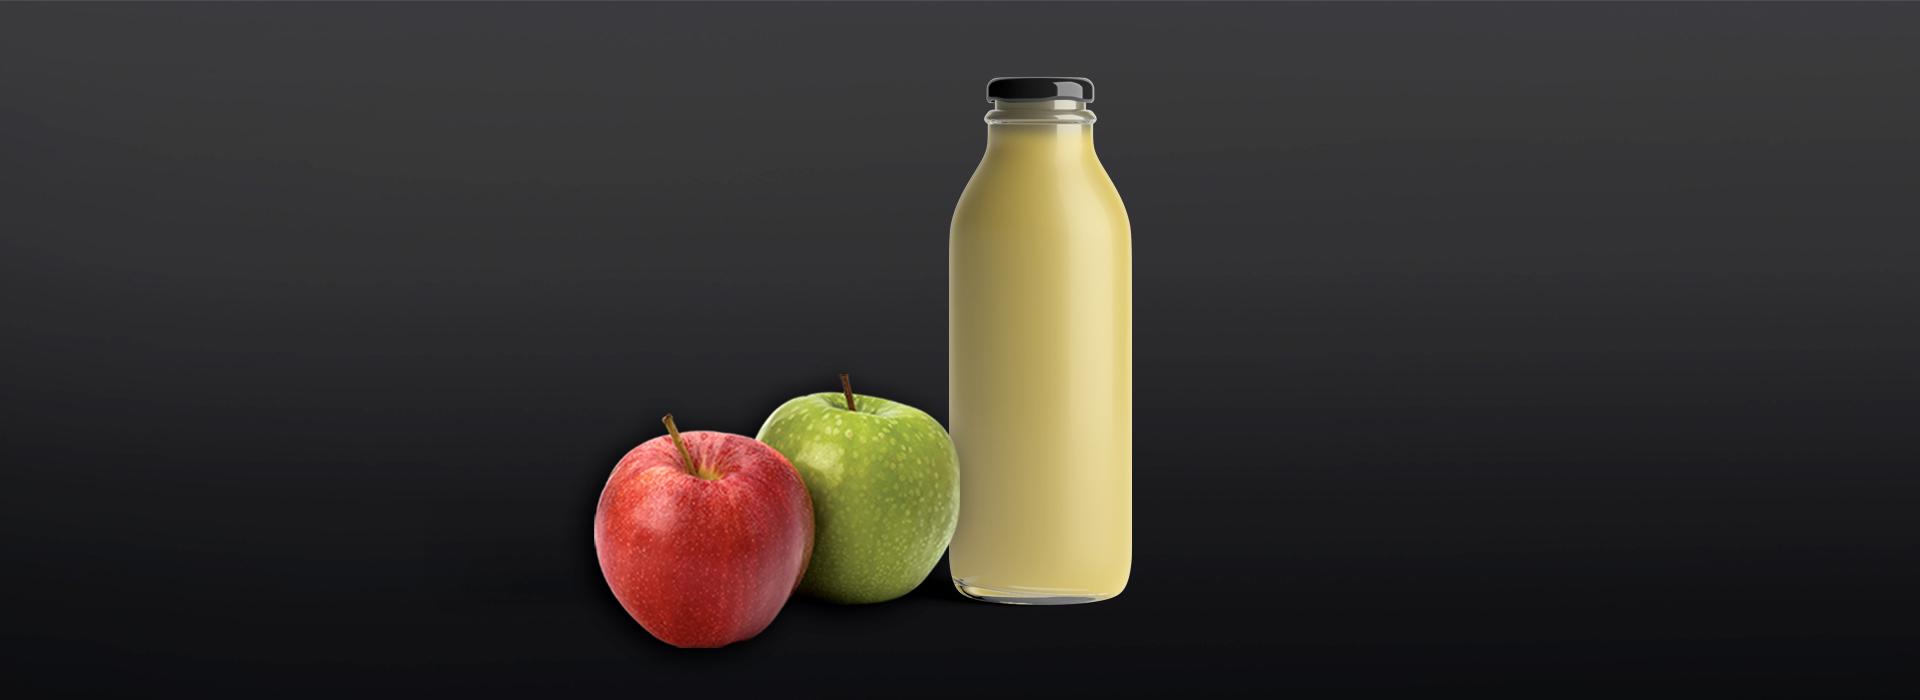 Sraml-Pome-fruit-pressed-juice